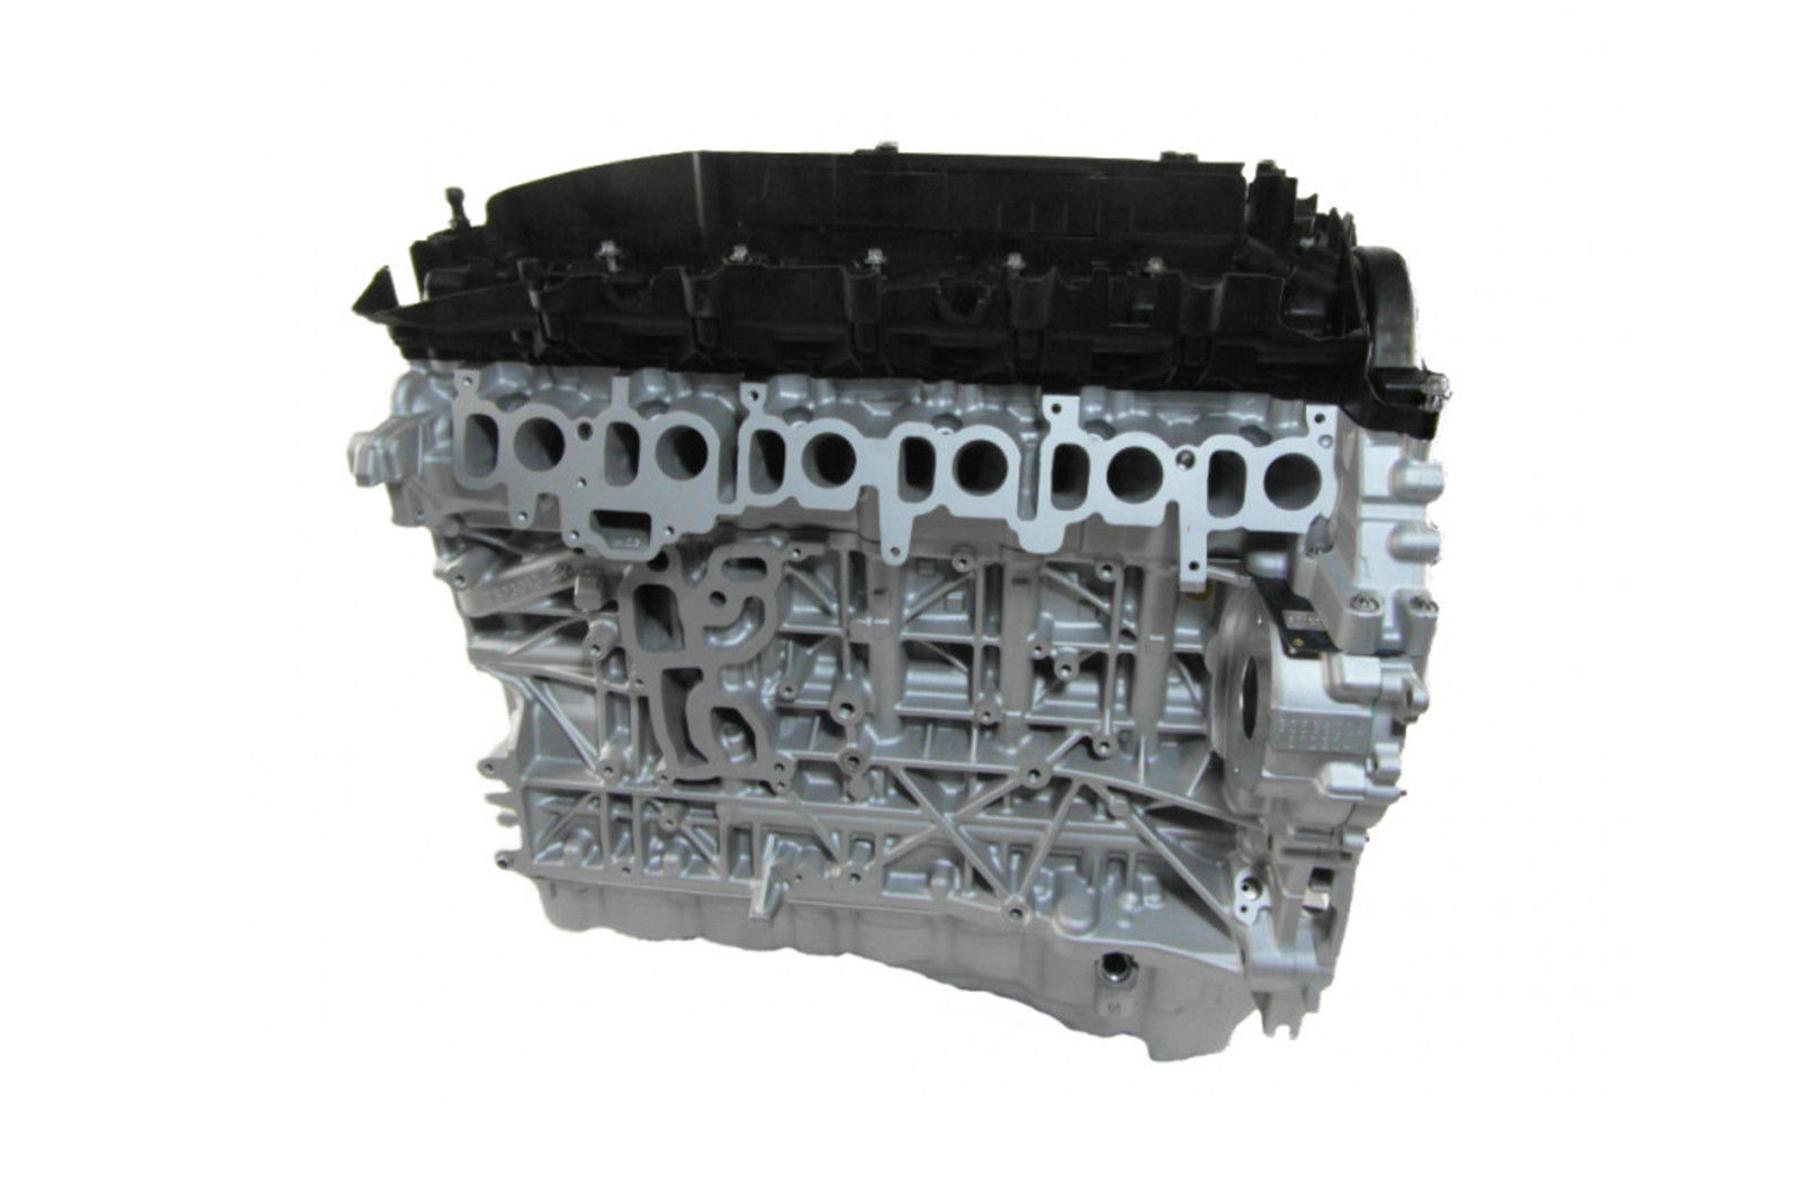 ART DE Generalüberholt Motor BMW X3 3 0D F25 xDrive 30d